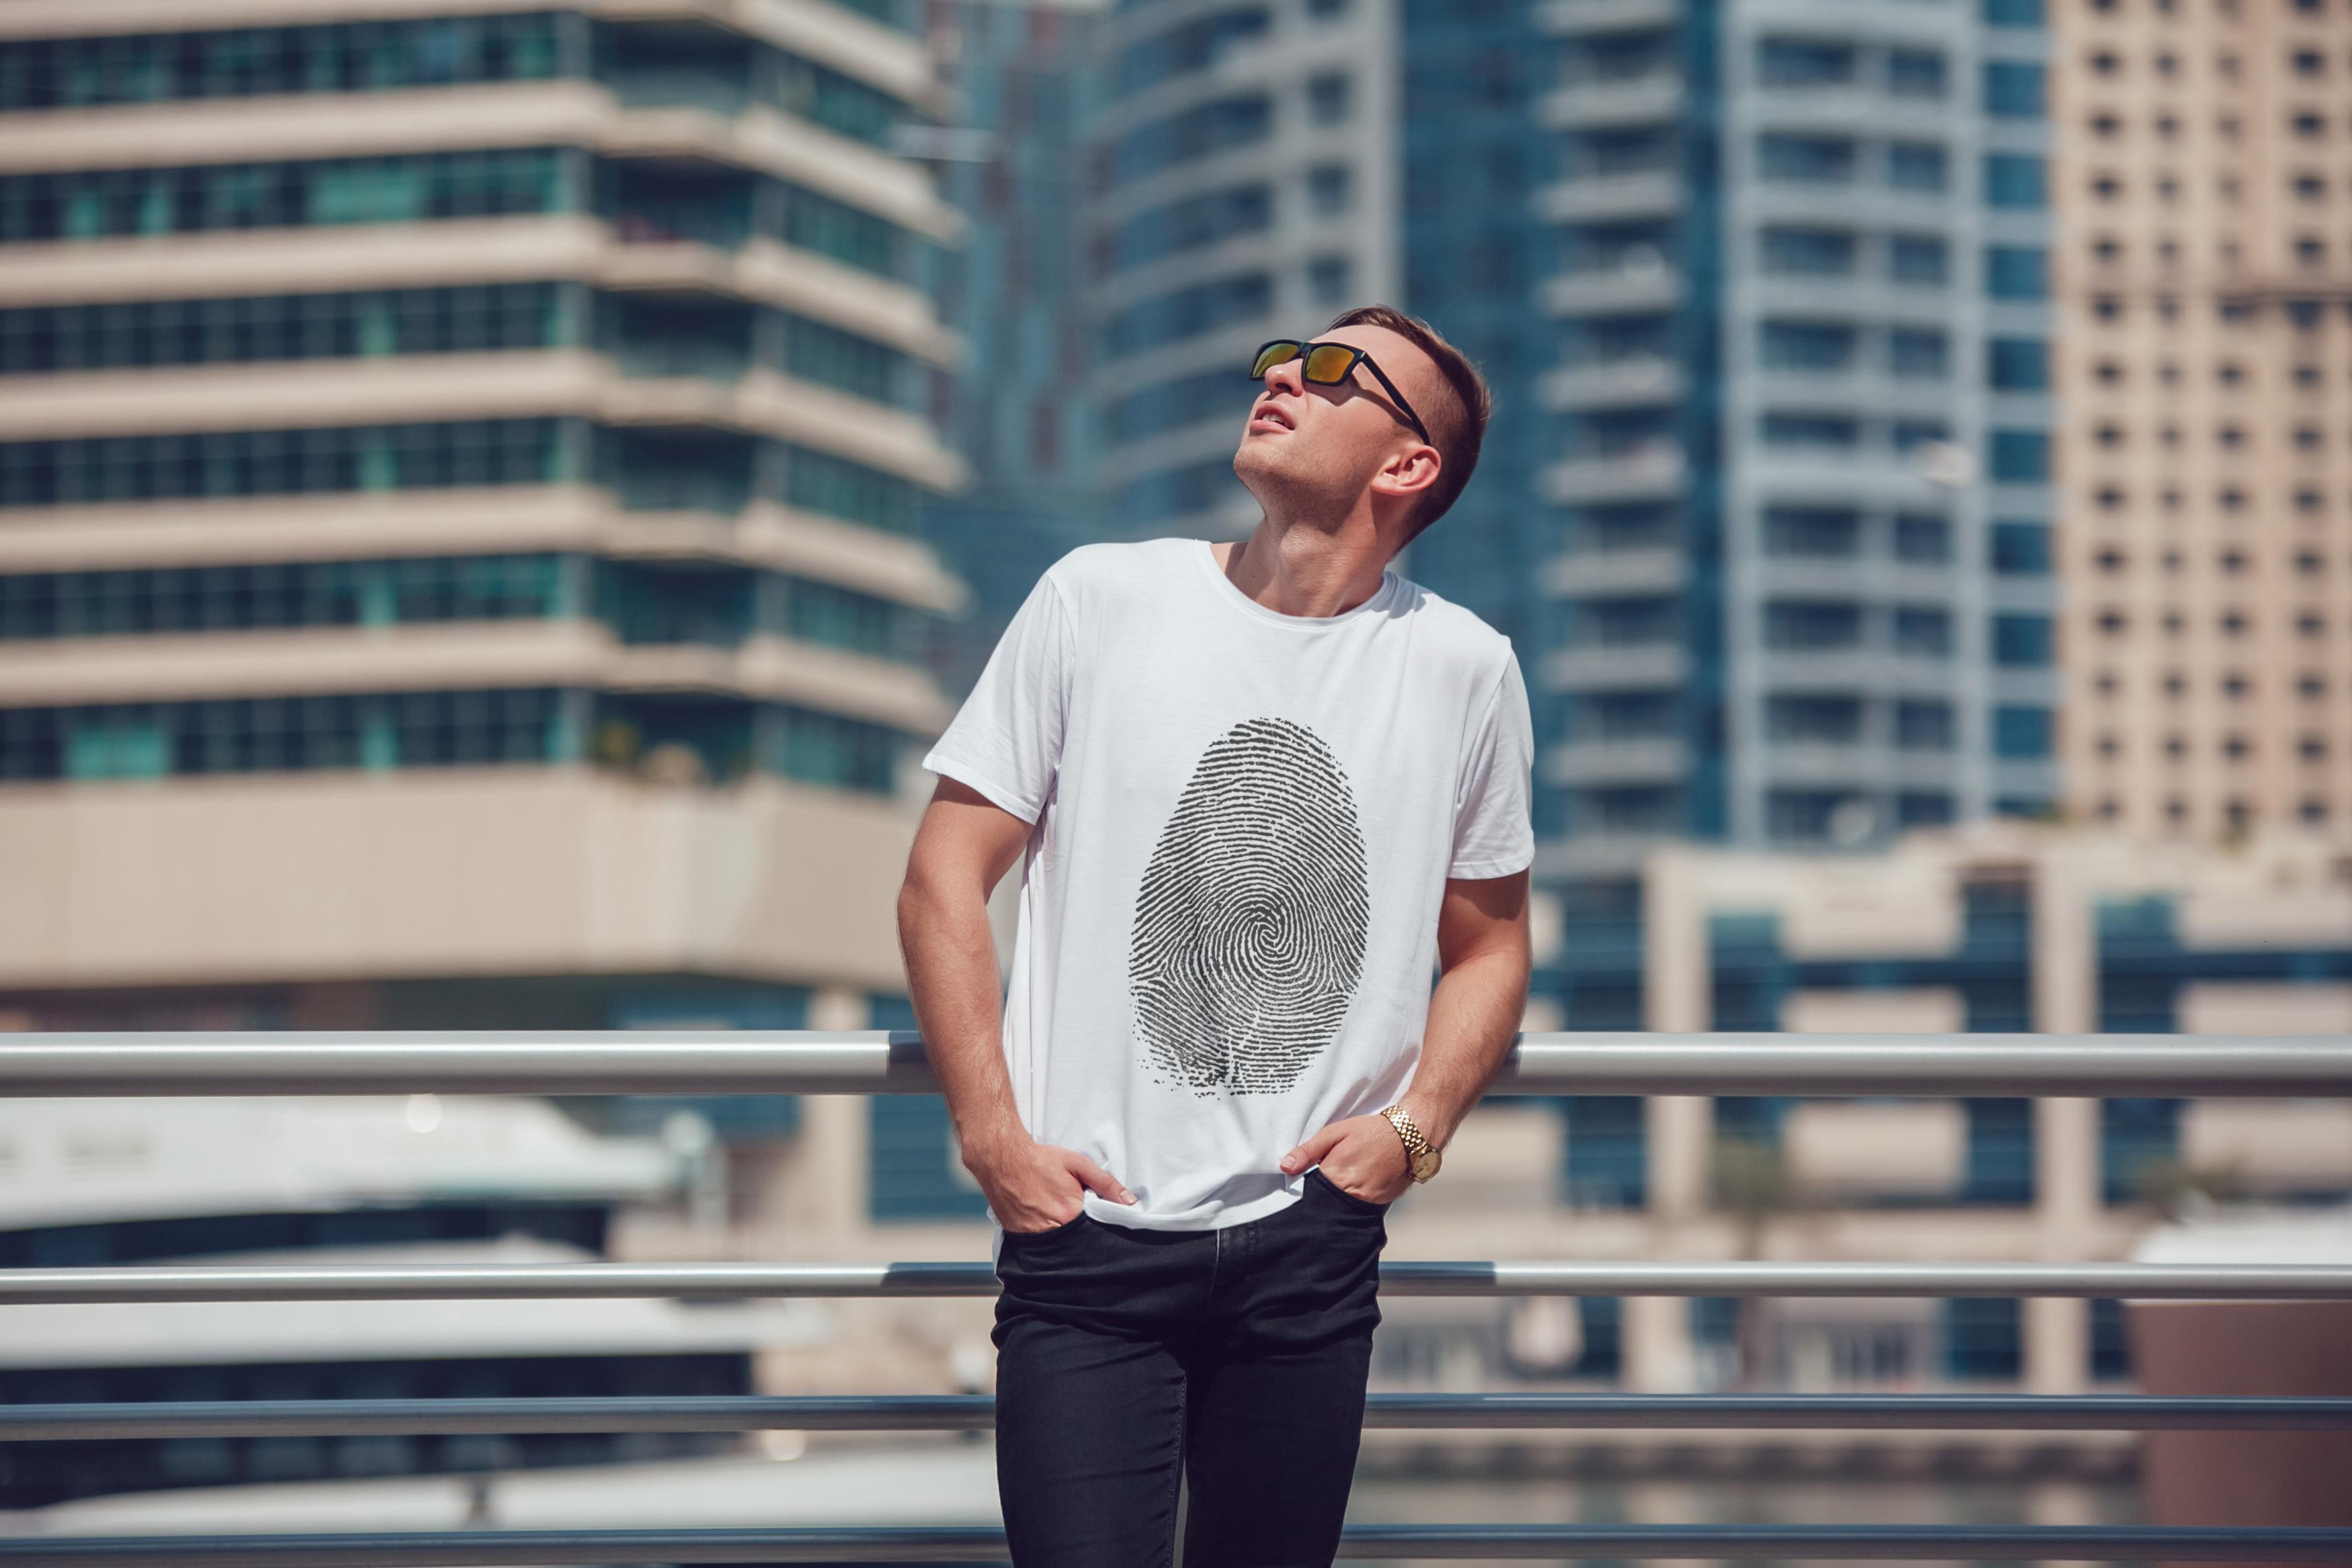 Men's T-Shirt Mock-Up Vol.5 2017 example image 6